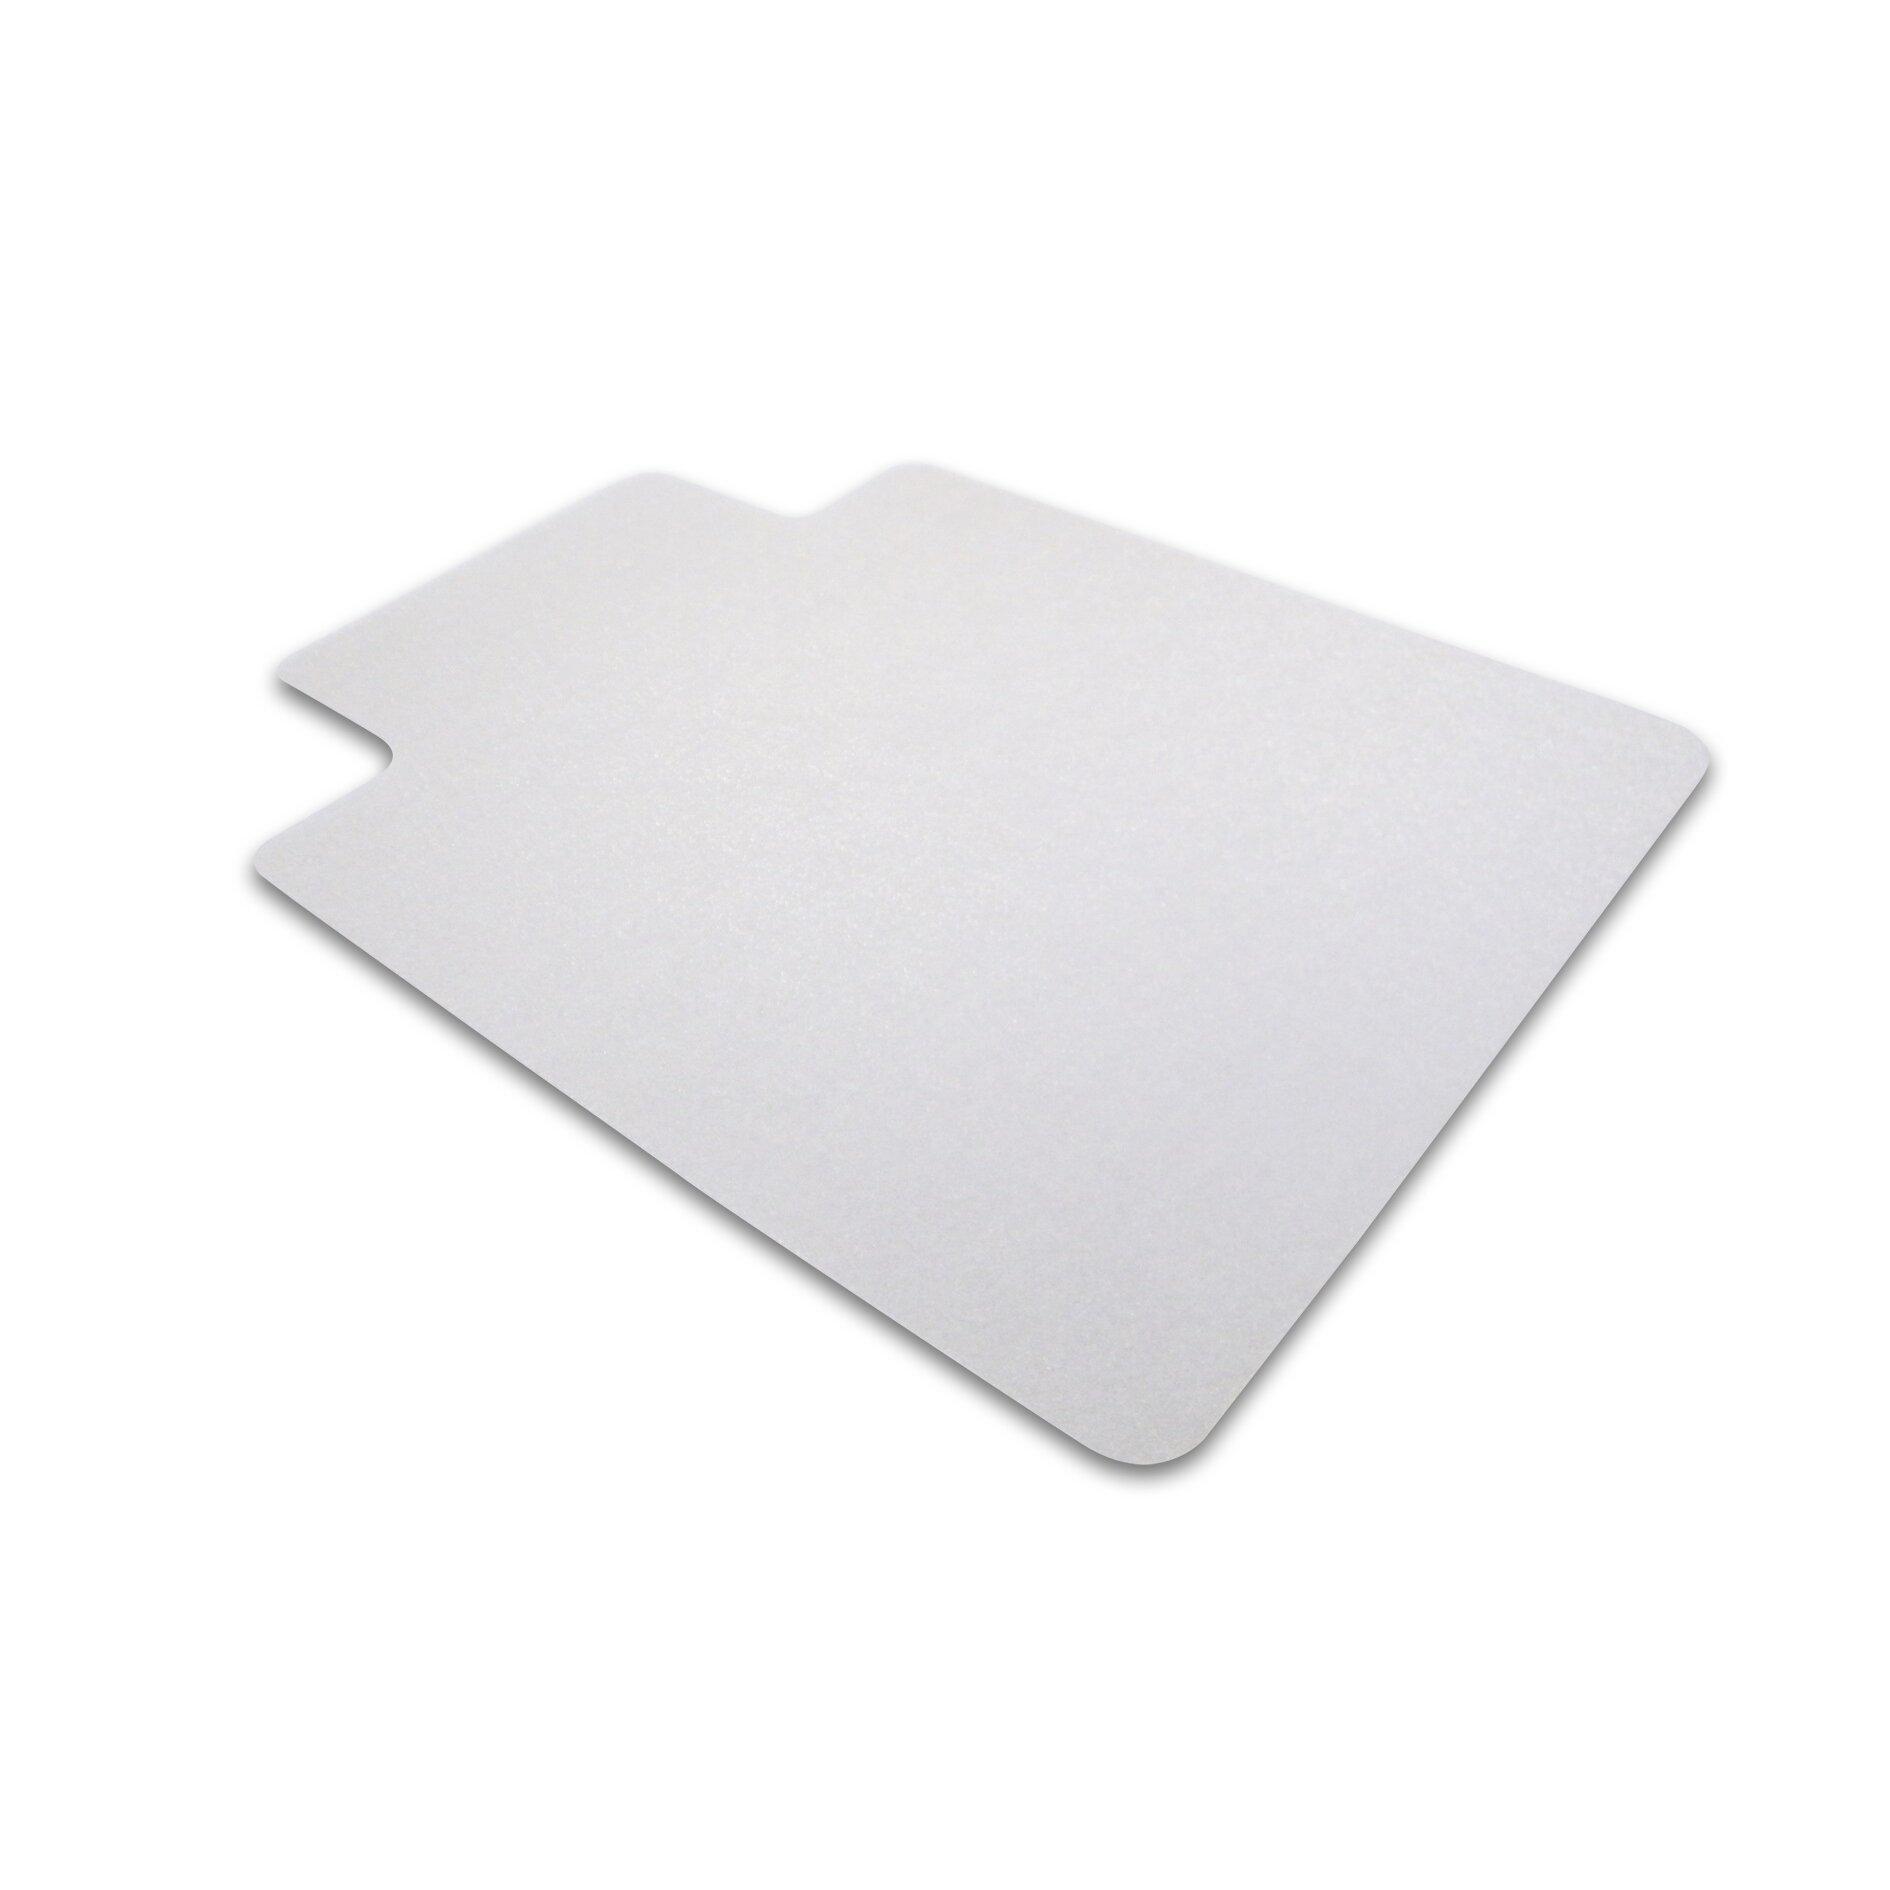 floortex cleartex hard floor chair mat reviews wayfair. Black Bedroom Furniture Sets. Home Design Ideas